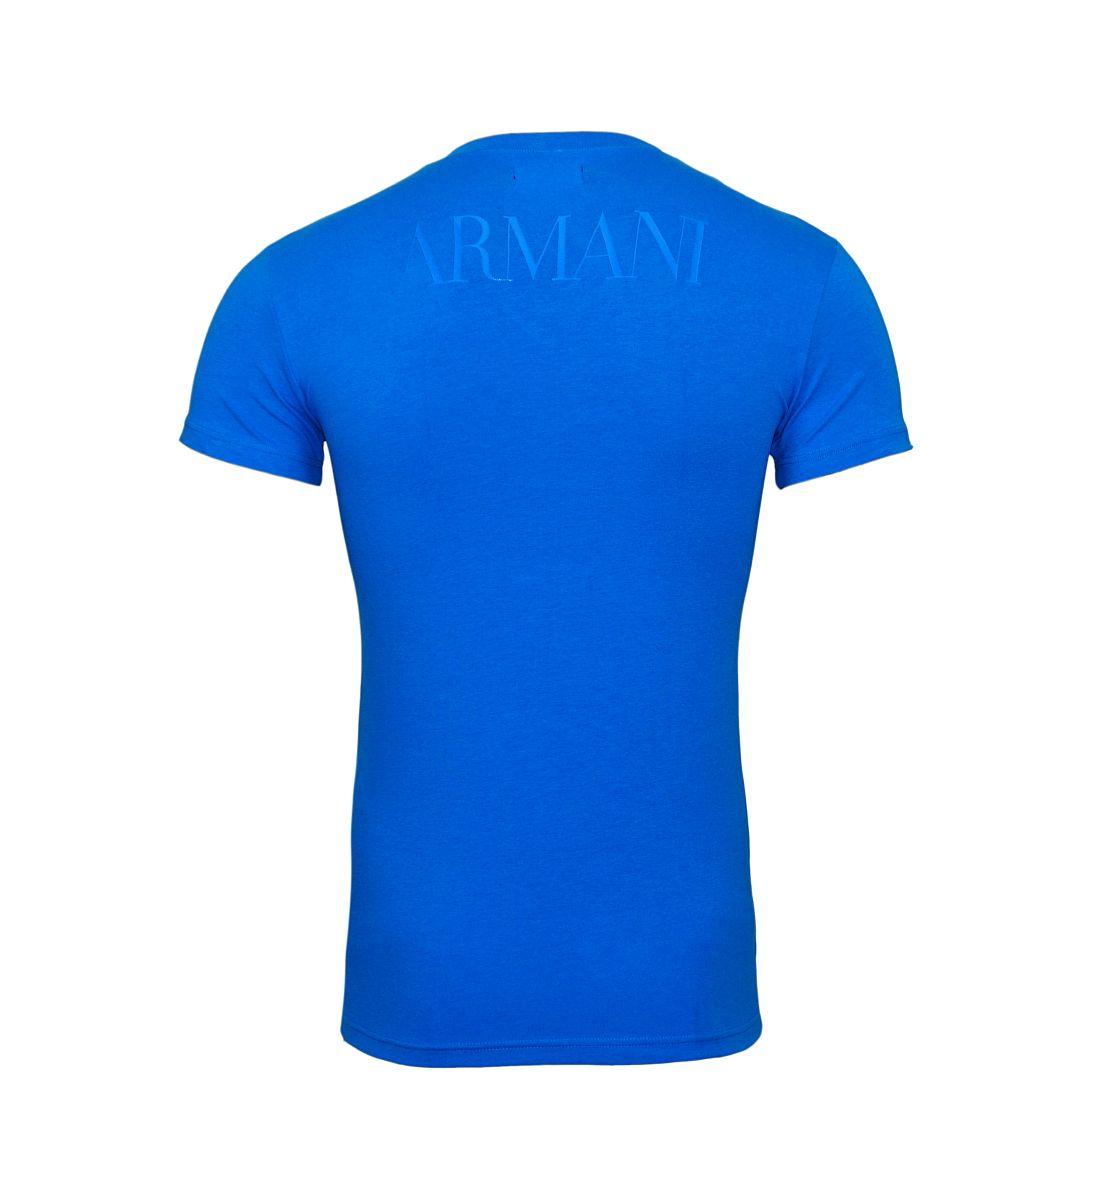 Emporio Armani T-Shirts V-Ausschnitt 110810 8P516 20833 CIELO W18-EATS1